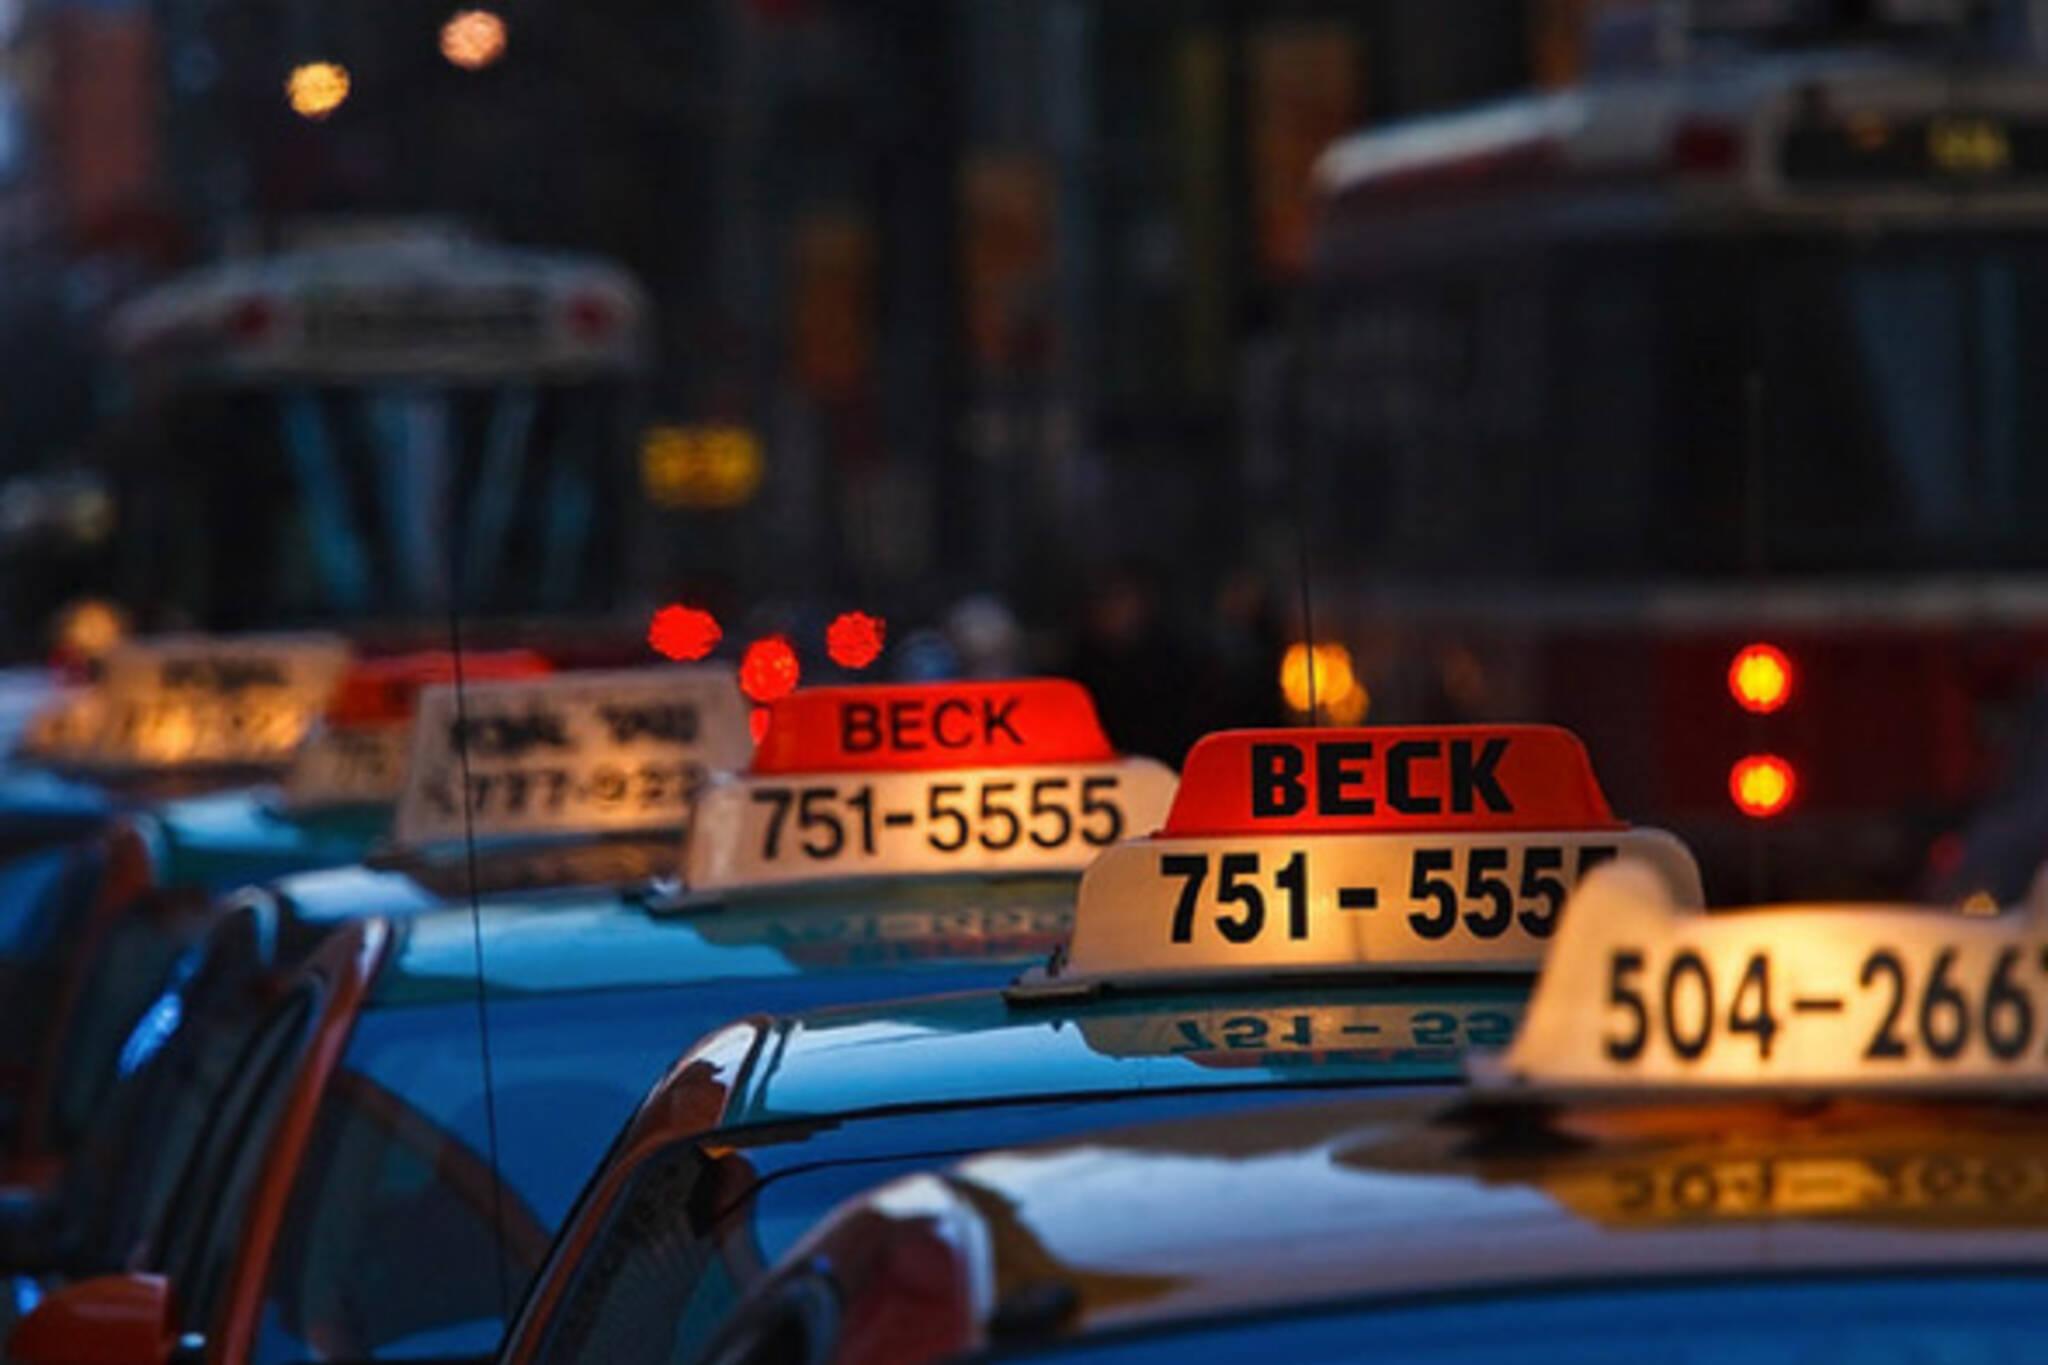 Toronto taxis